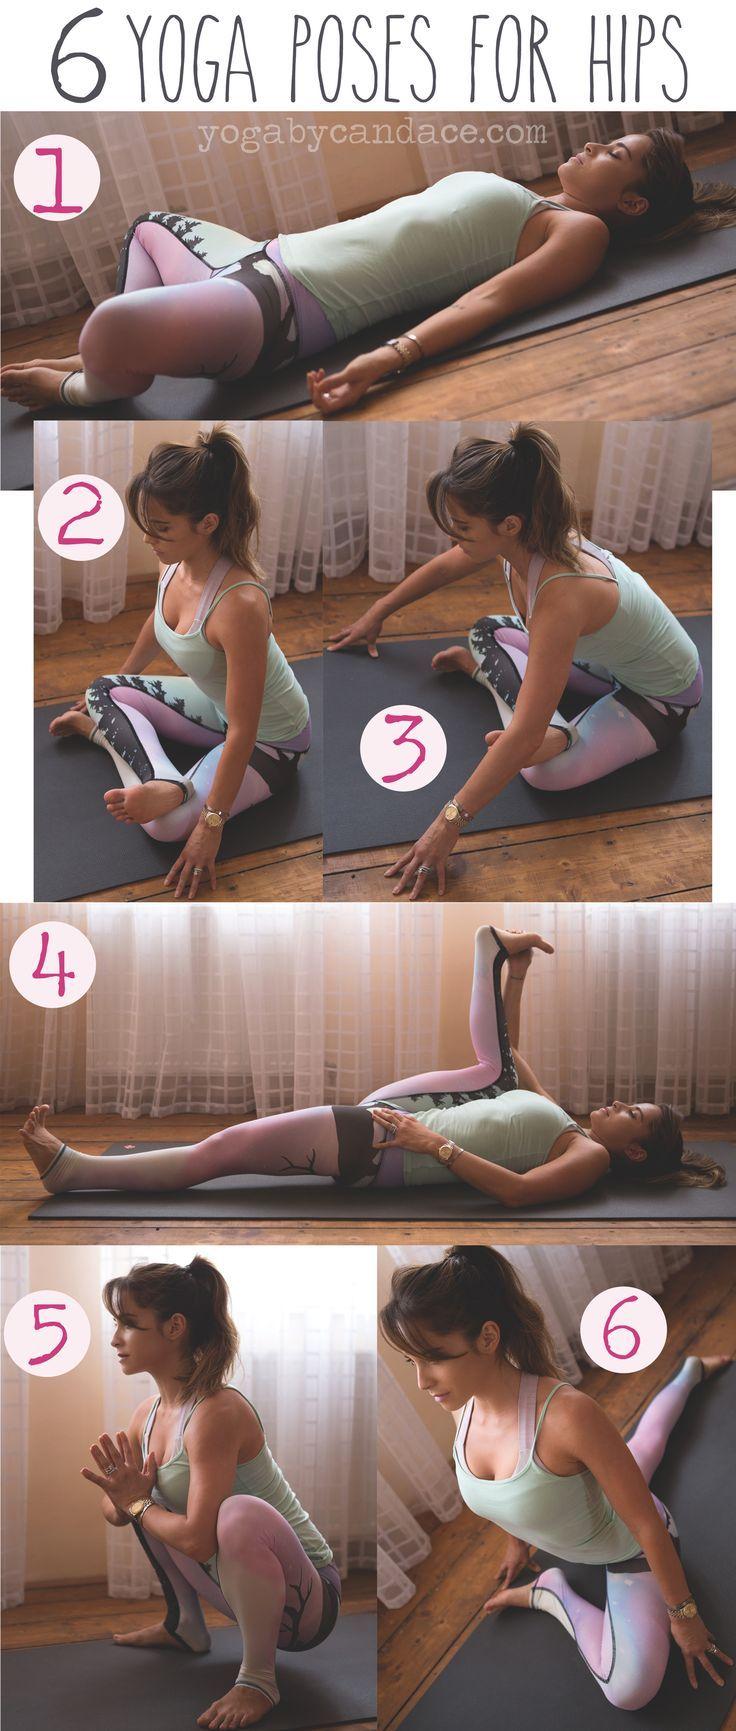 Pin now, practice later! 6 yoga poses for hips! Wearing: Teeki northern lights pants, tank. Using: Manduka mat: